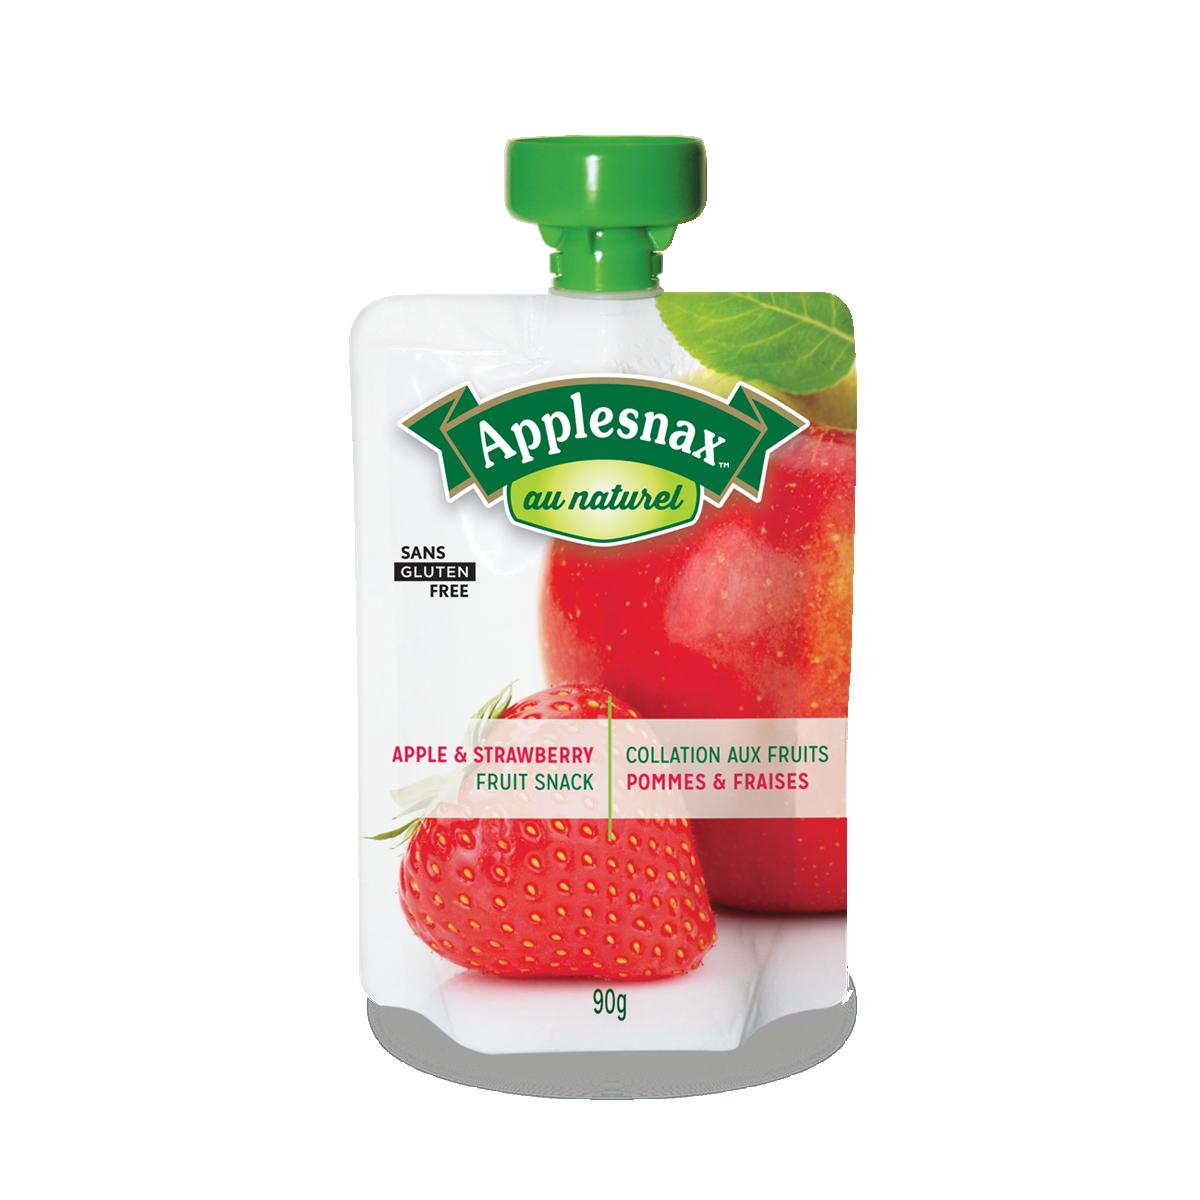 Applesnax Au Naturel Apple & Strawberry Pouches